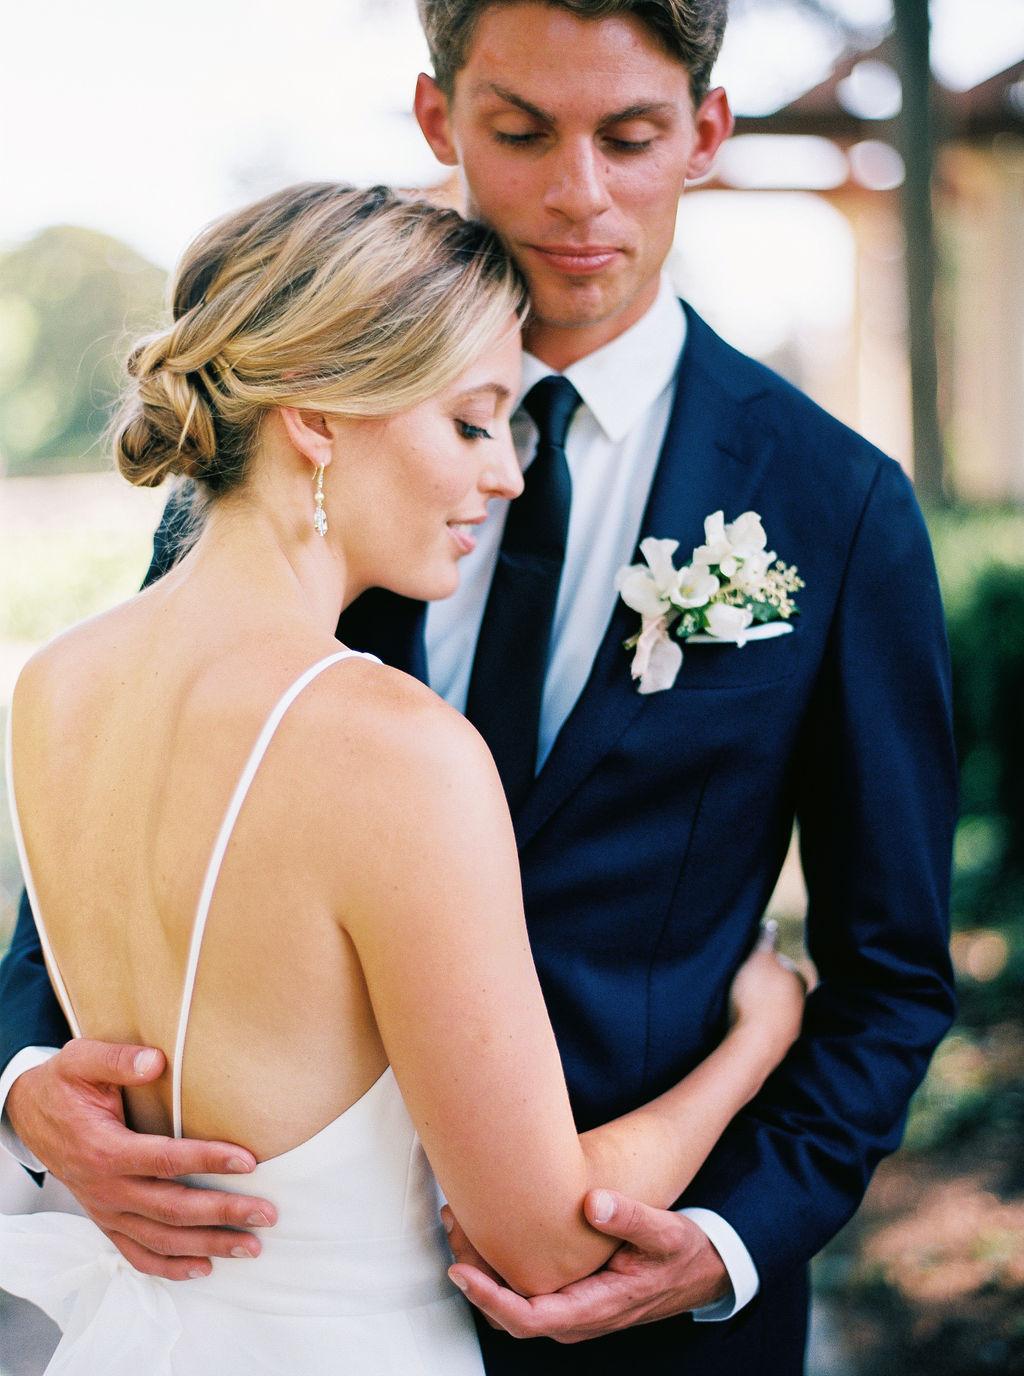 Alexandra-Elise-Photography-Film-Wedding-Photographer-Sonnenberg-Gardens-Finger-Lakes-Canandaigua-Bride-Groom-037.jpg